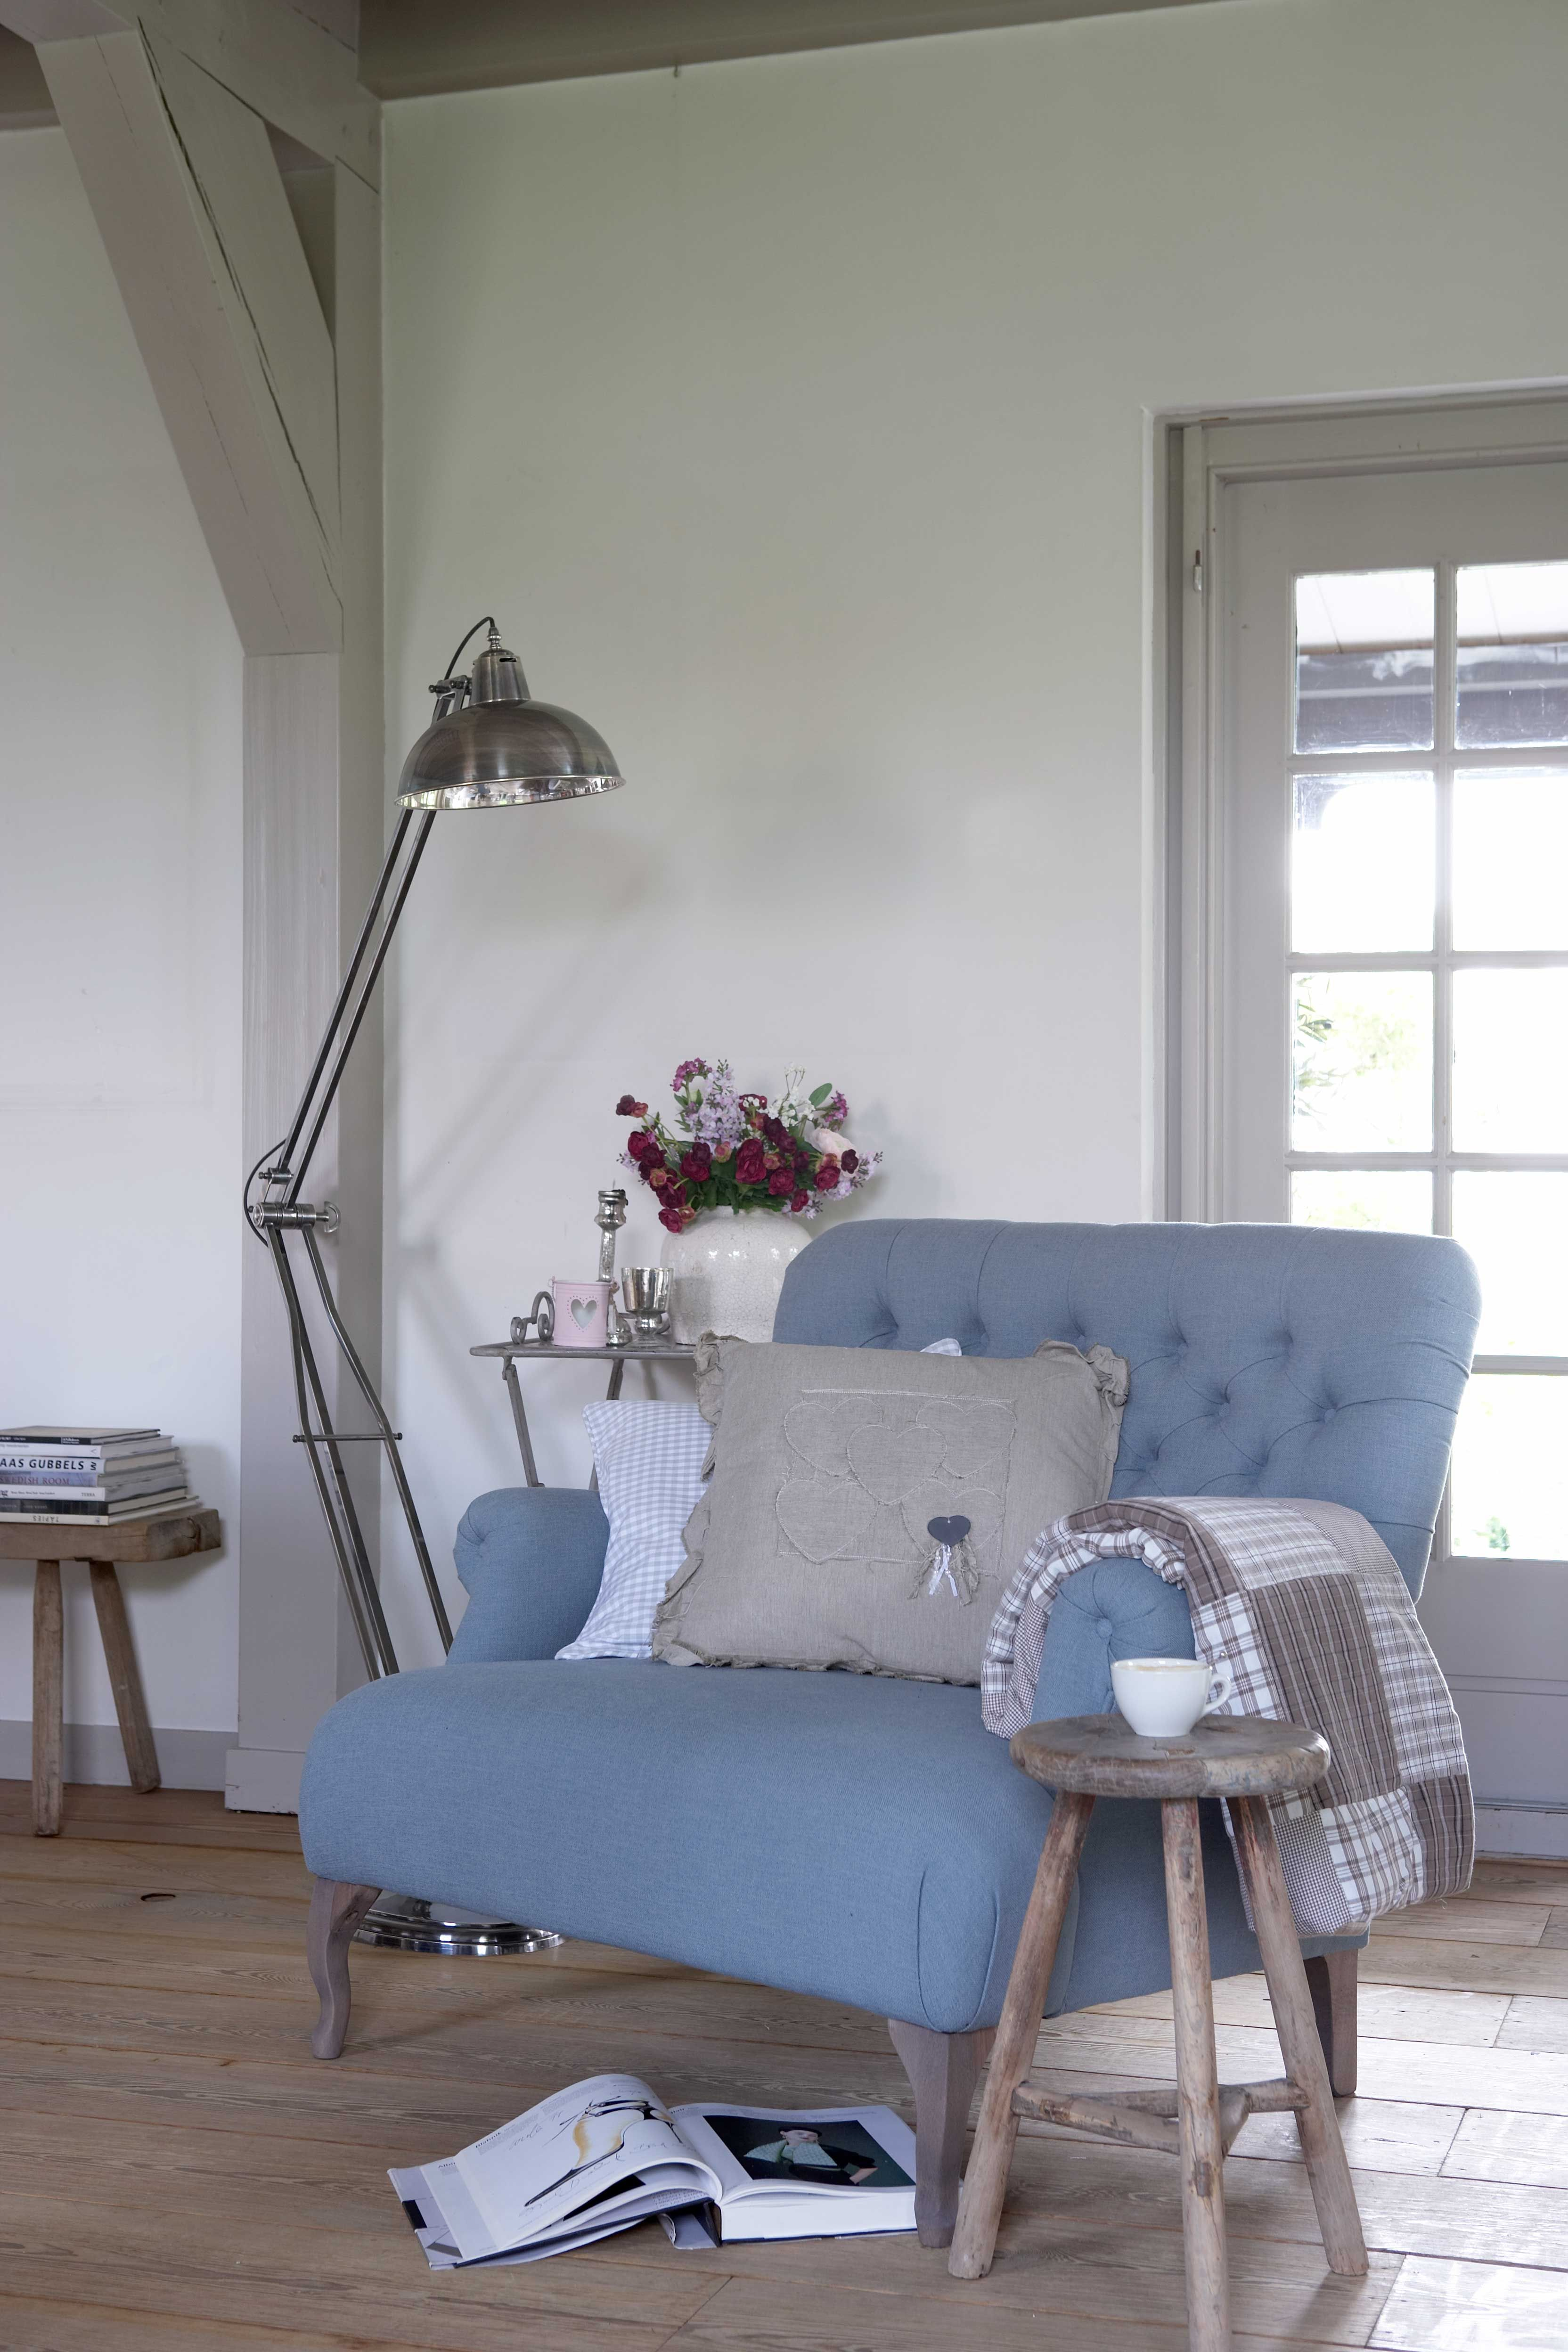 Gezellig samenkruipen in deze blauwe loveseat home styling